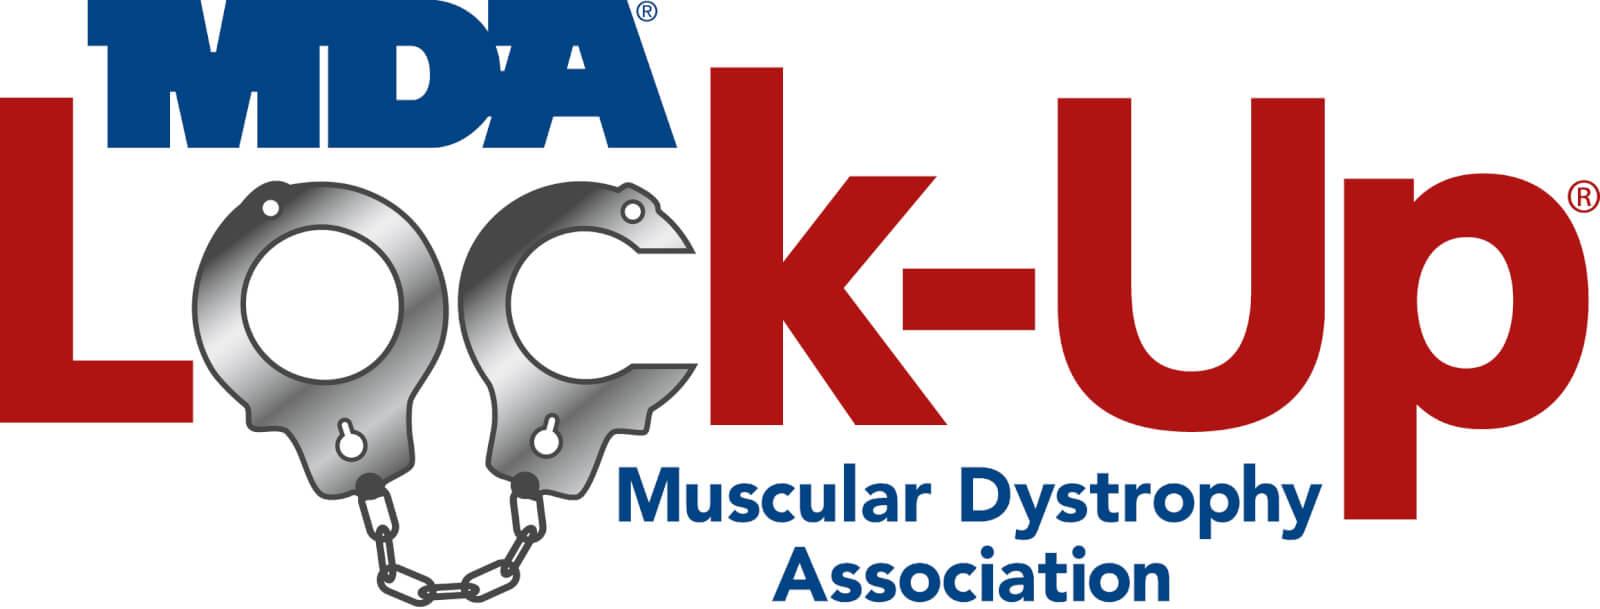 Muscular Dystrophy Association Lock-Up fundraiser